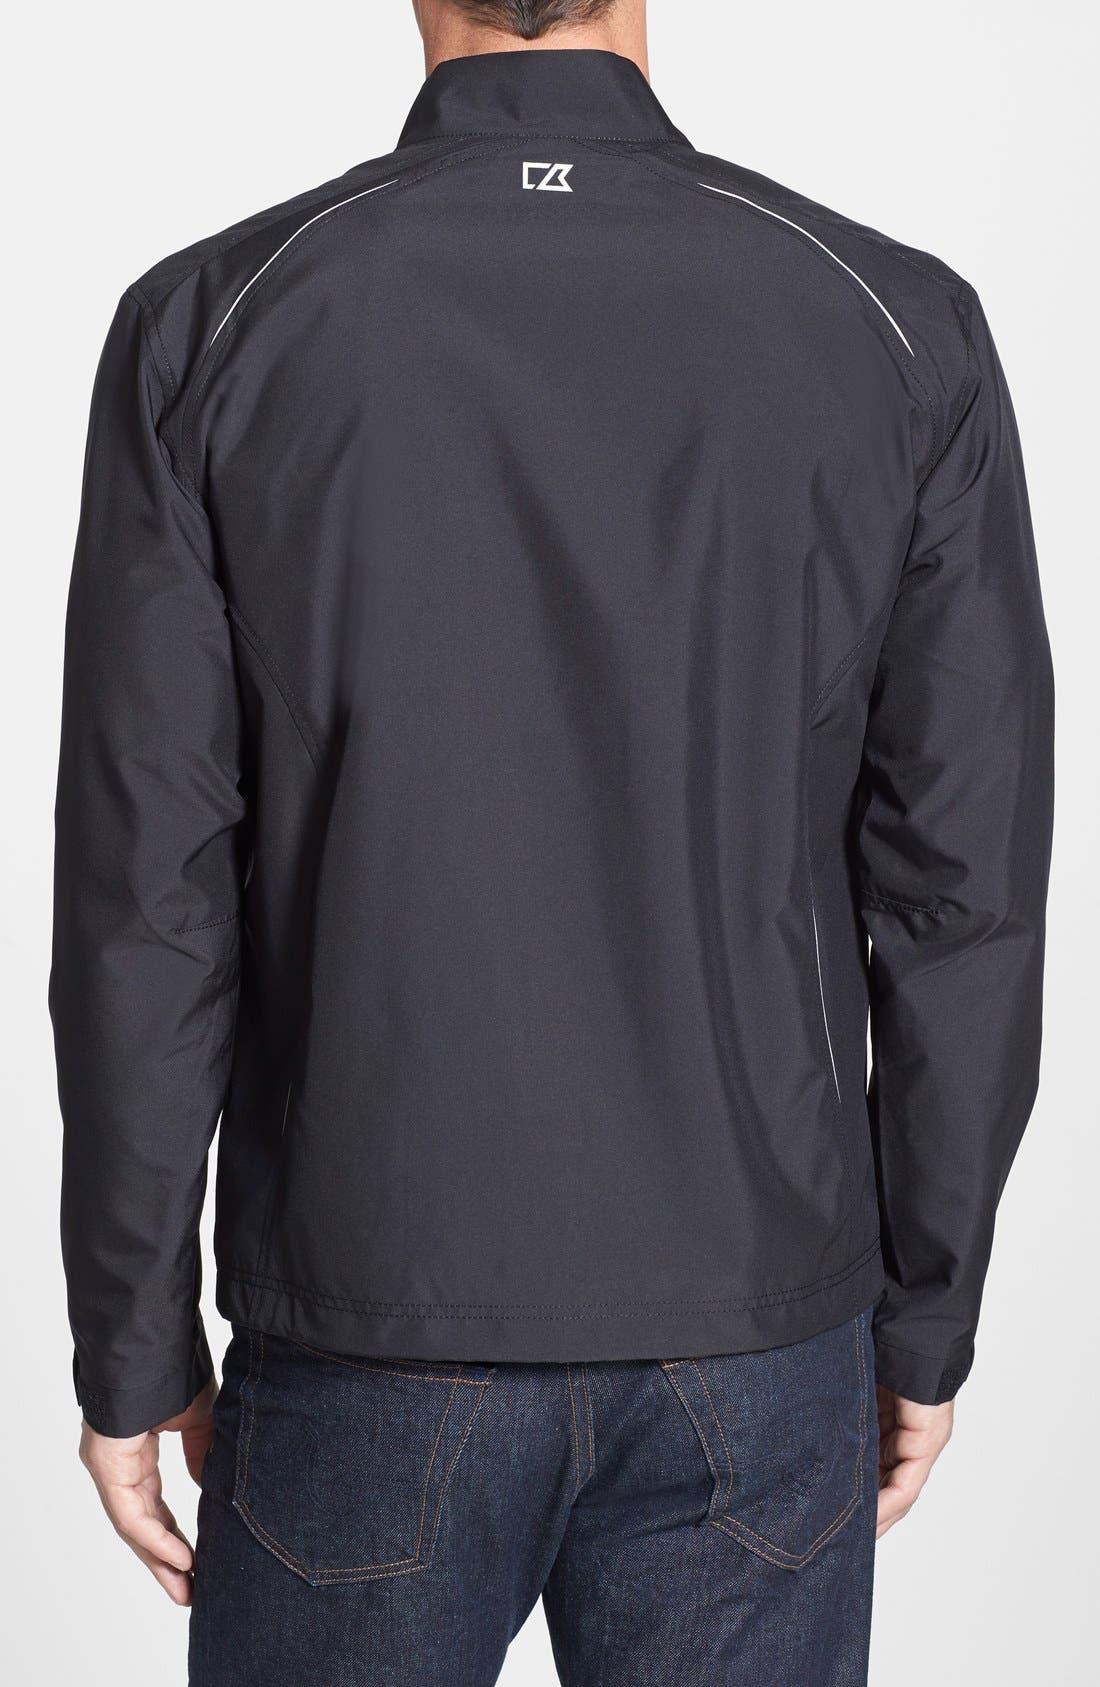 Philadelphia Eagles - Beacon WeatherTec Wind & Water Resistant Jacket,                             Alternate thumbnail 2, color,                             Black